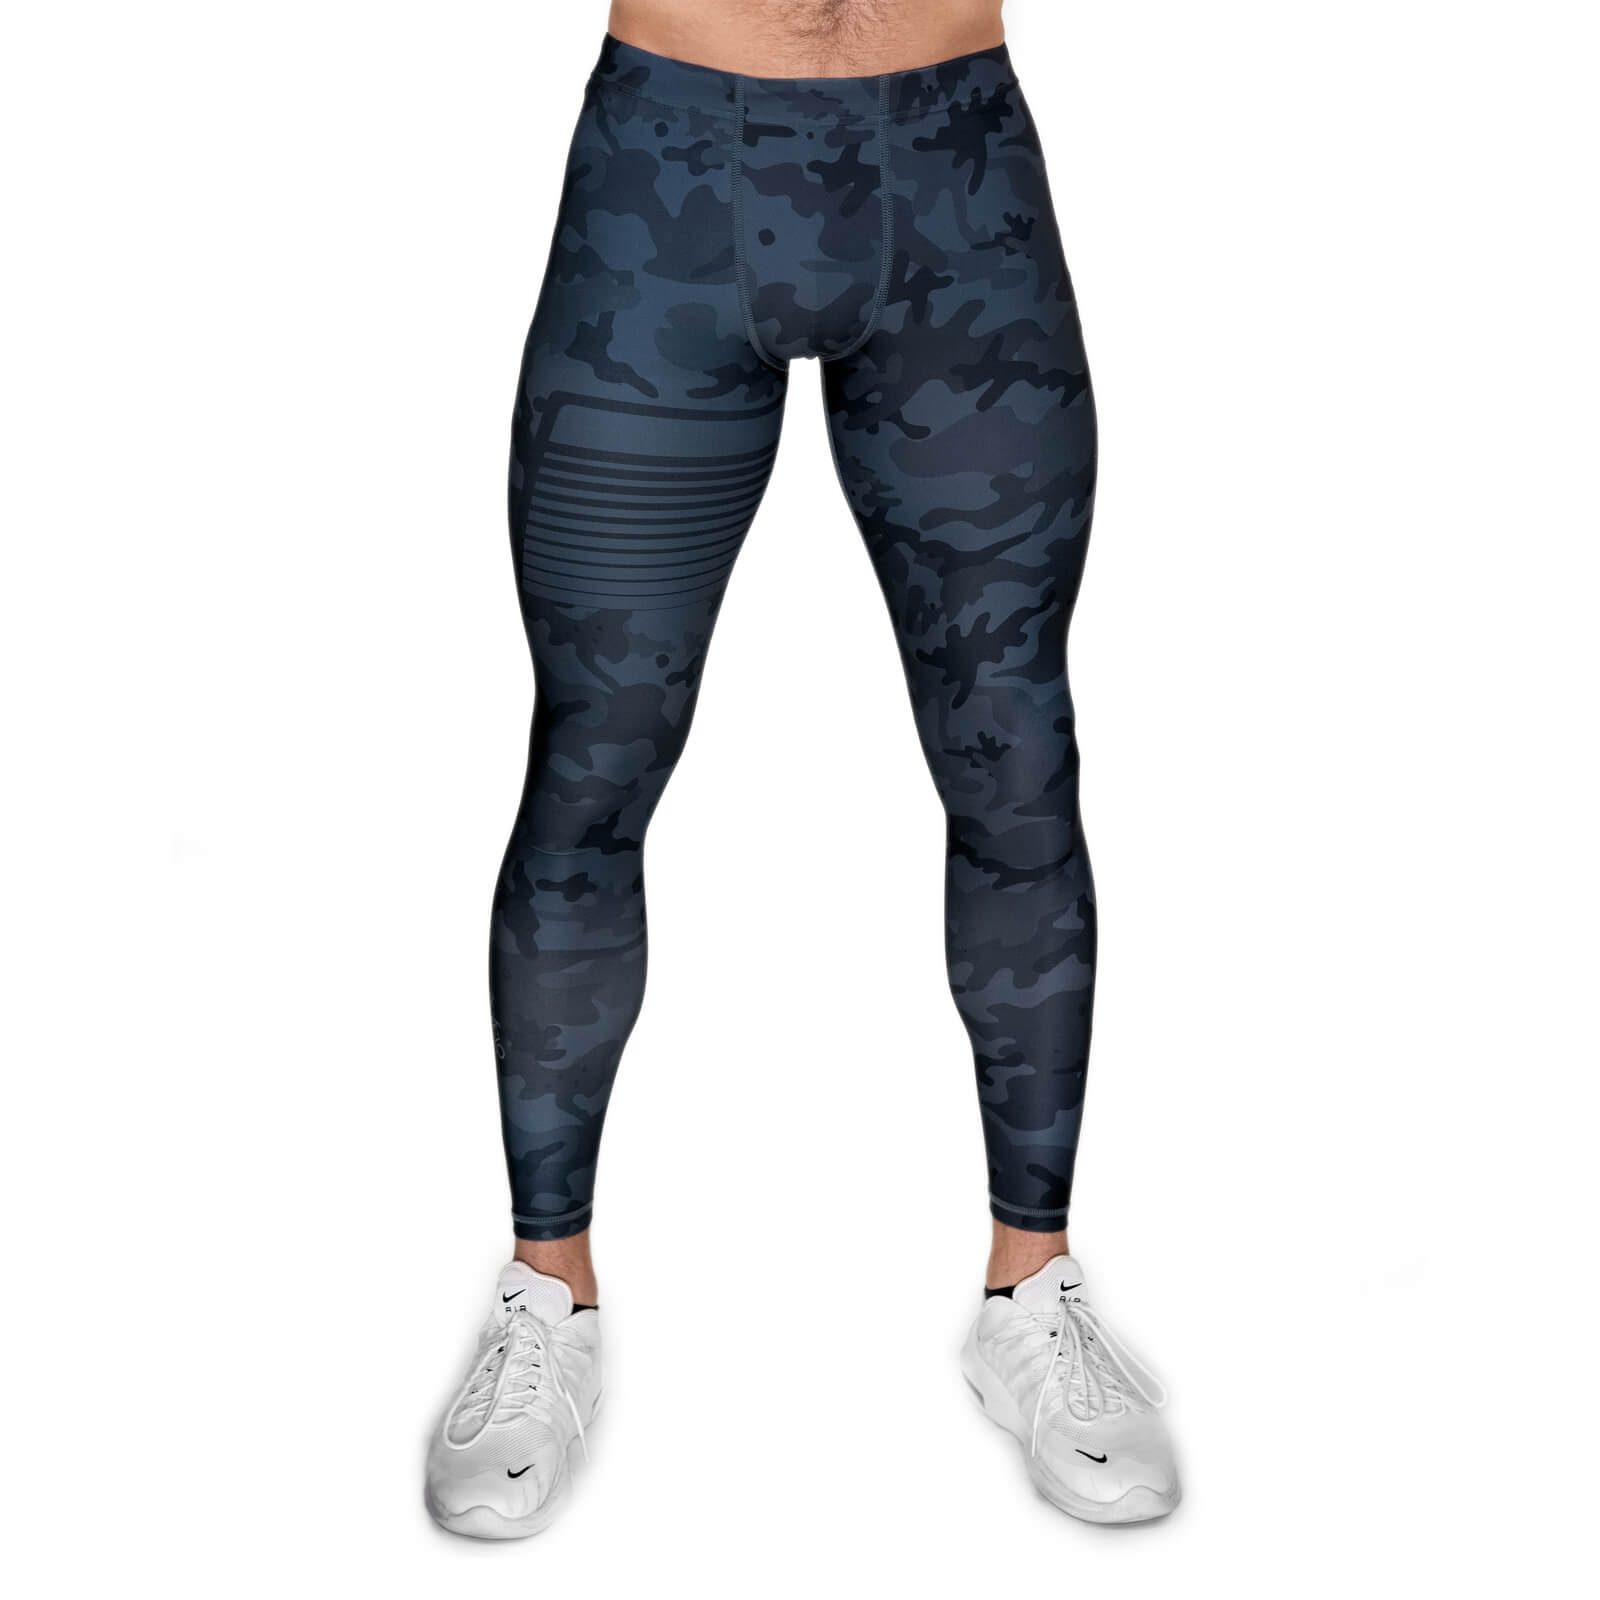 Gavelo Sniper Shorts, black, medium